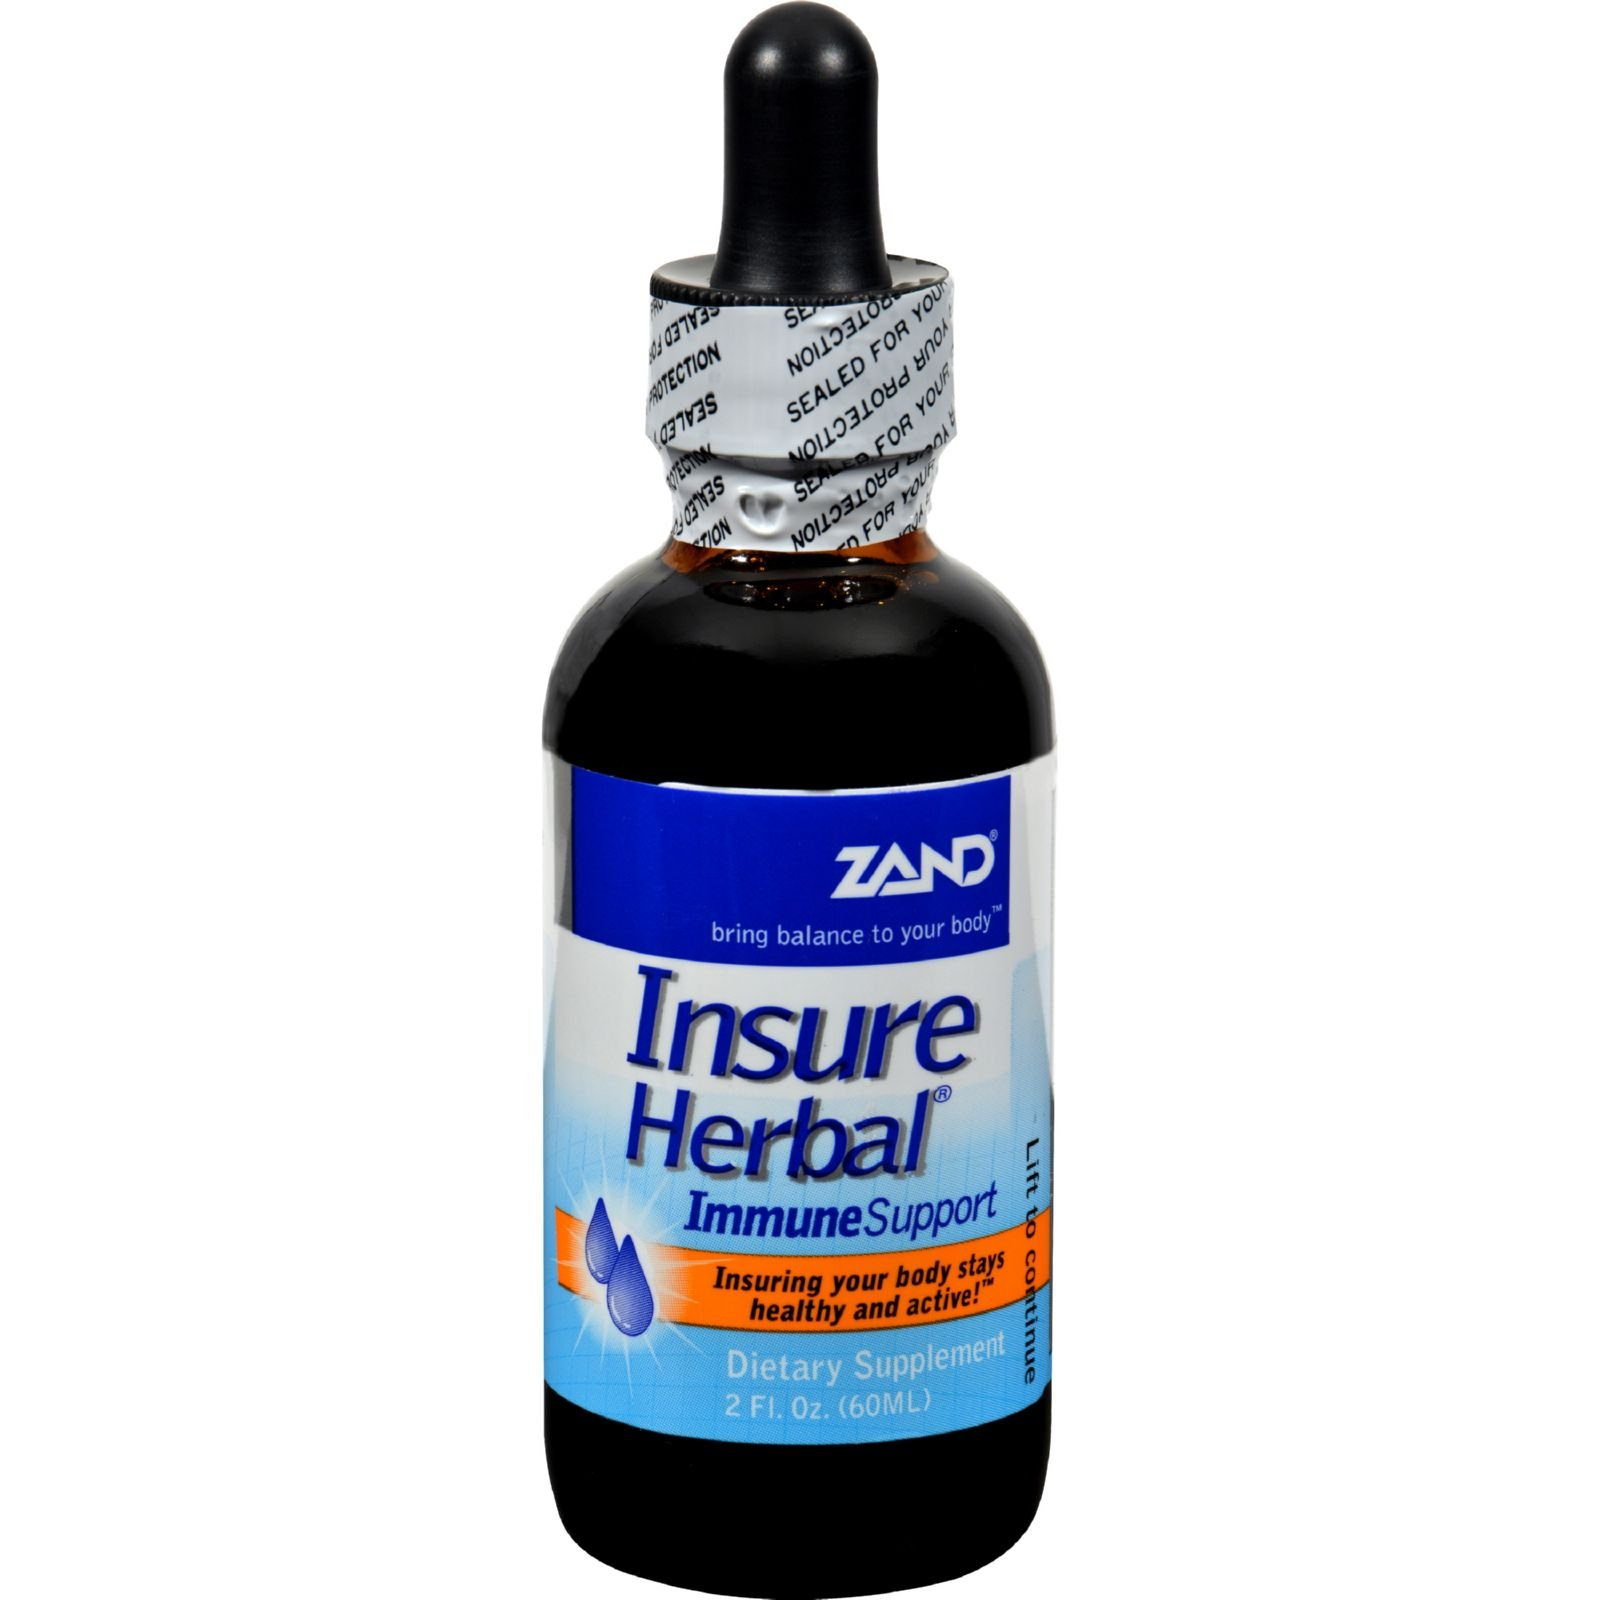 Zand Insure Immune Support - Echinacea and Goldenseal Formula - 2 fl oz (Pack of 2)